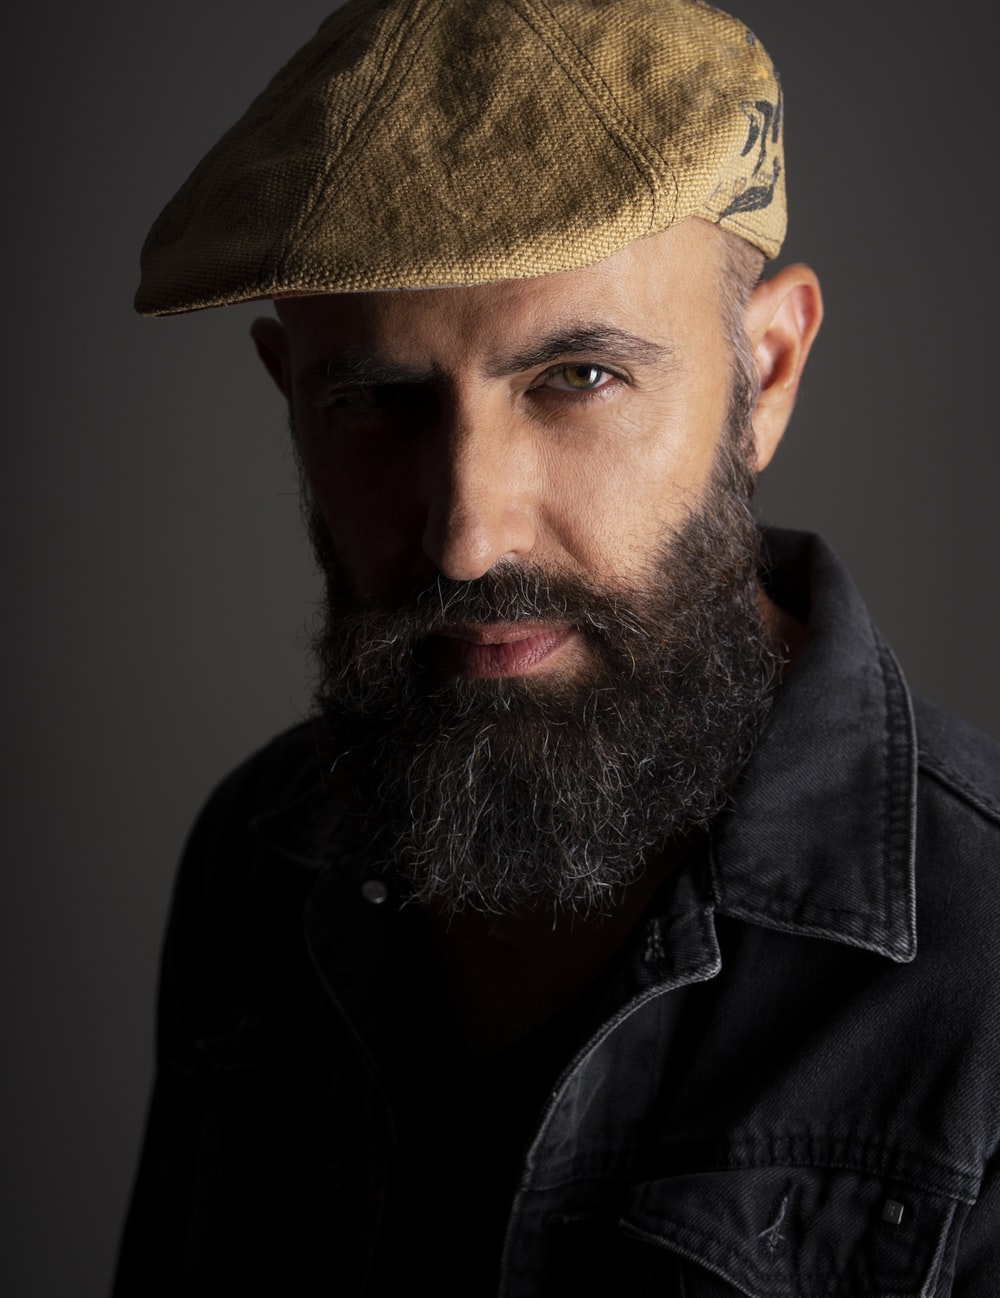 bearded man glaring